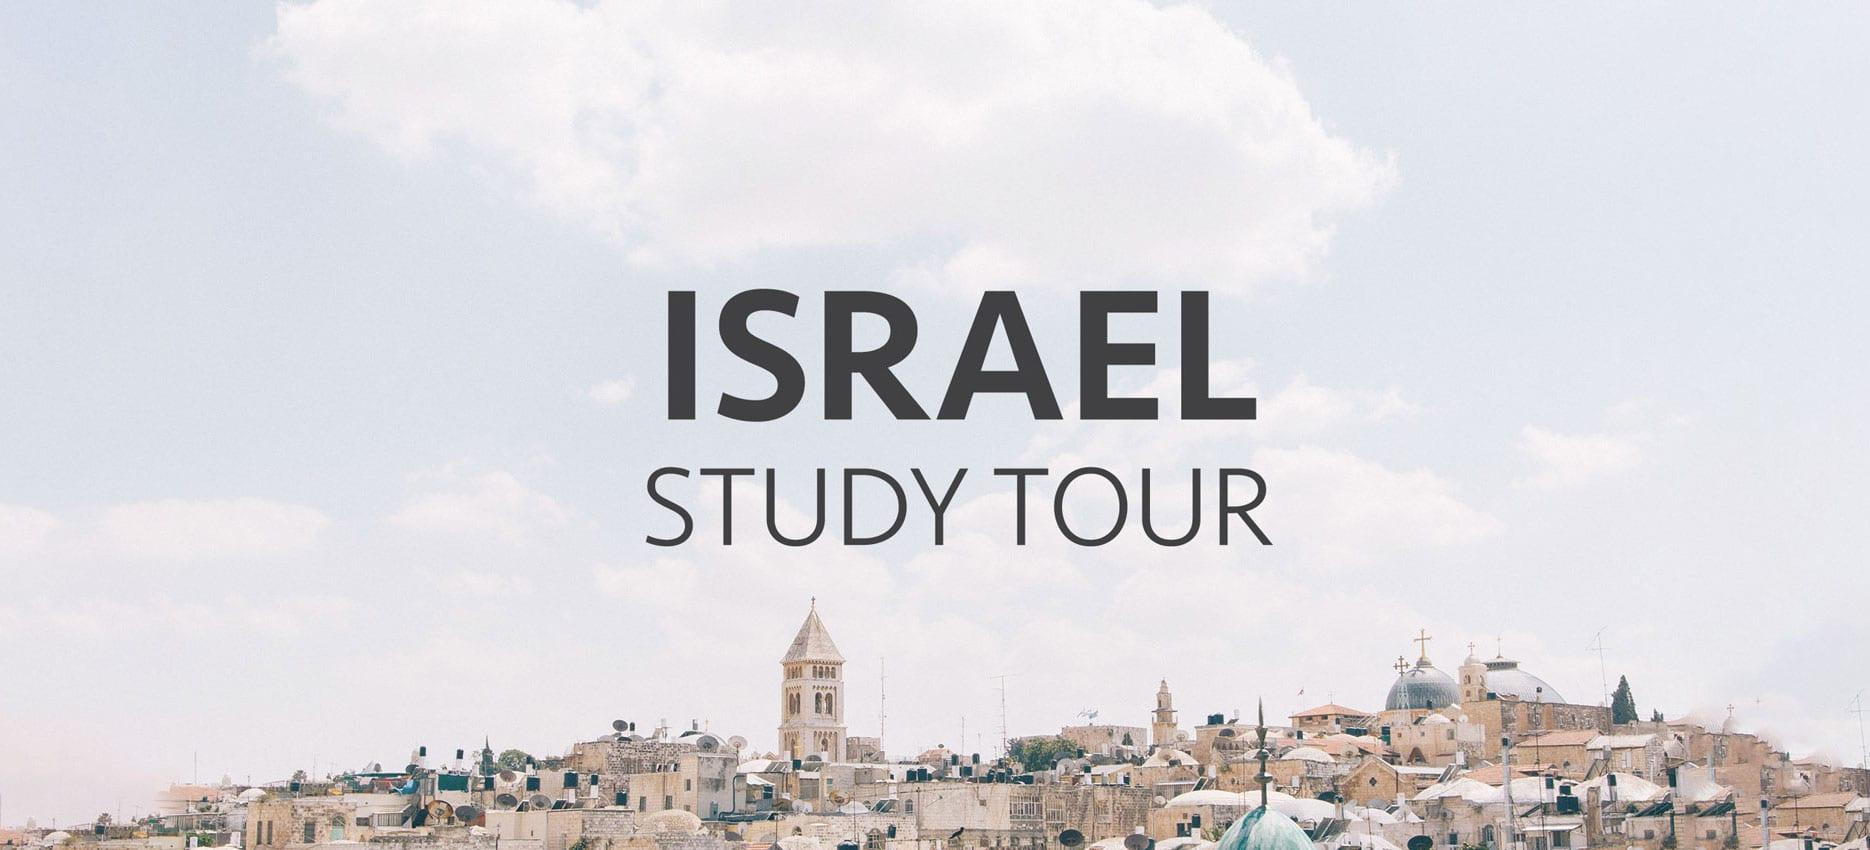 Israel-2018-web-hero-3